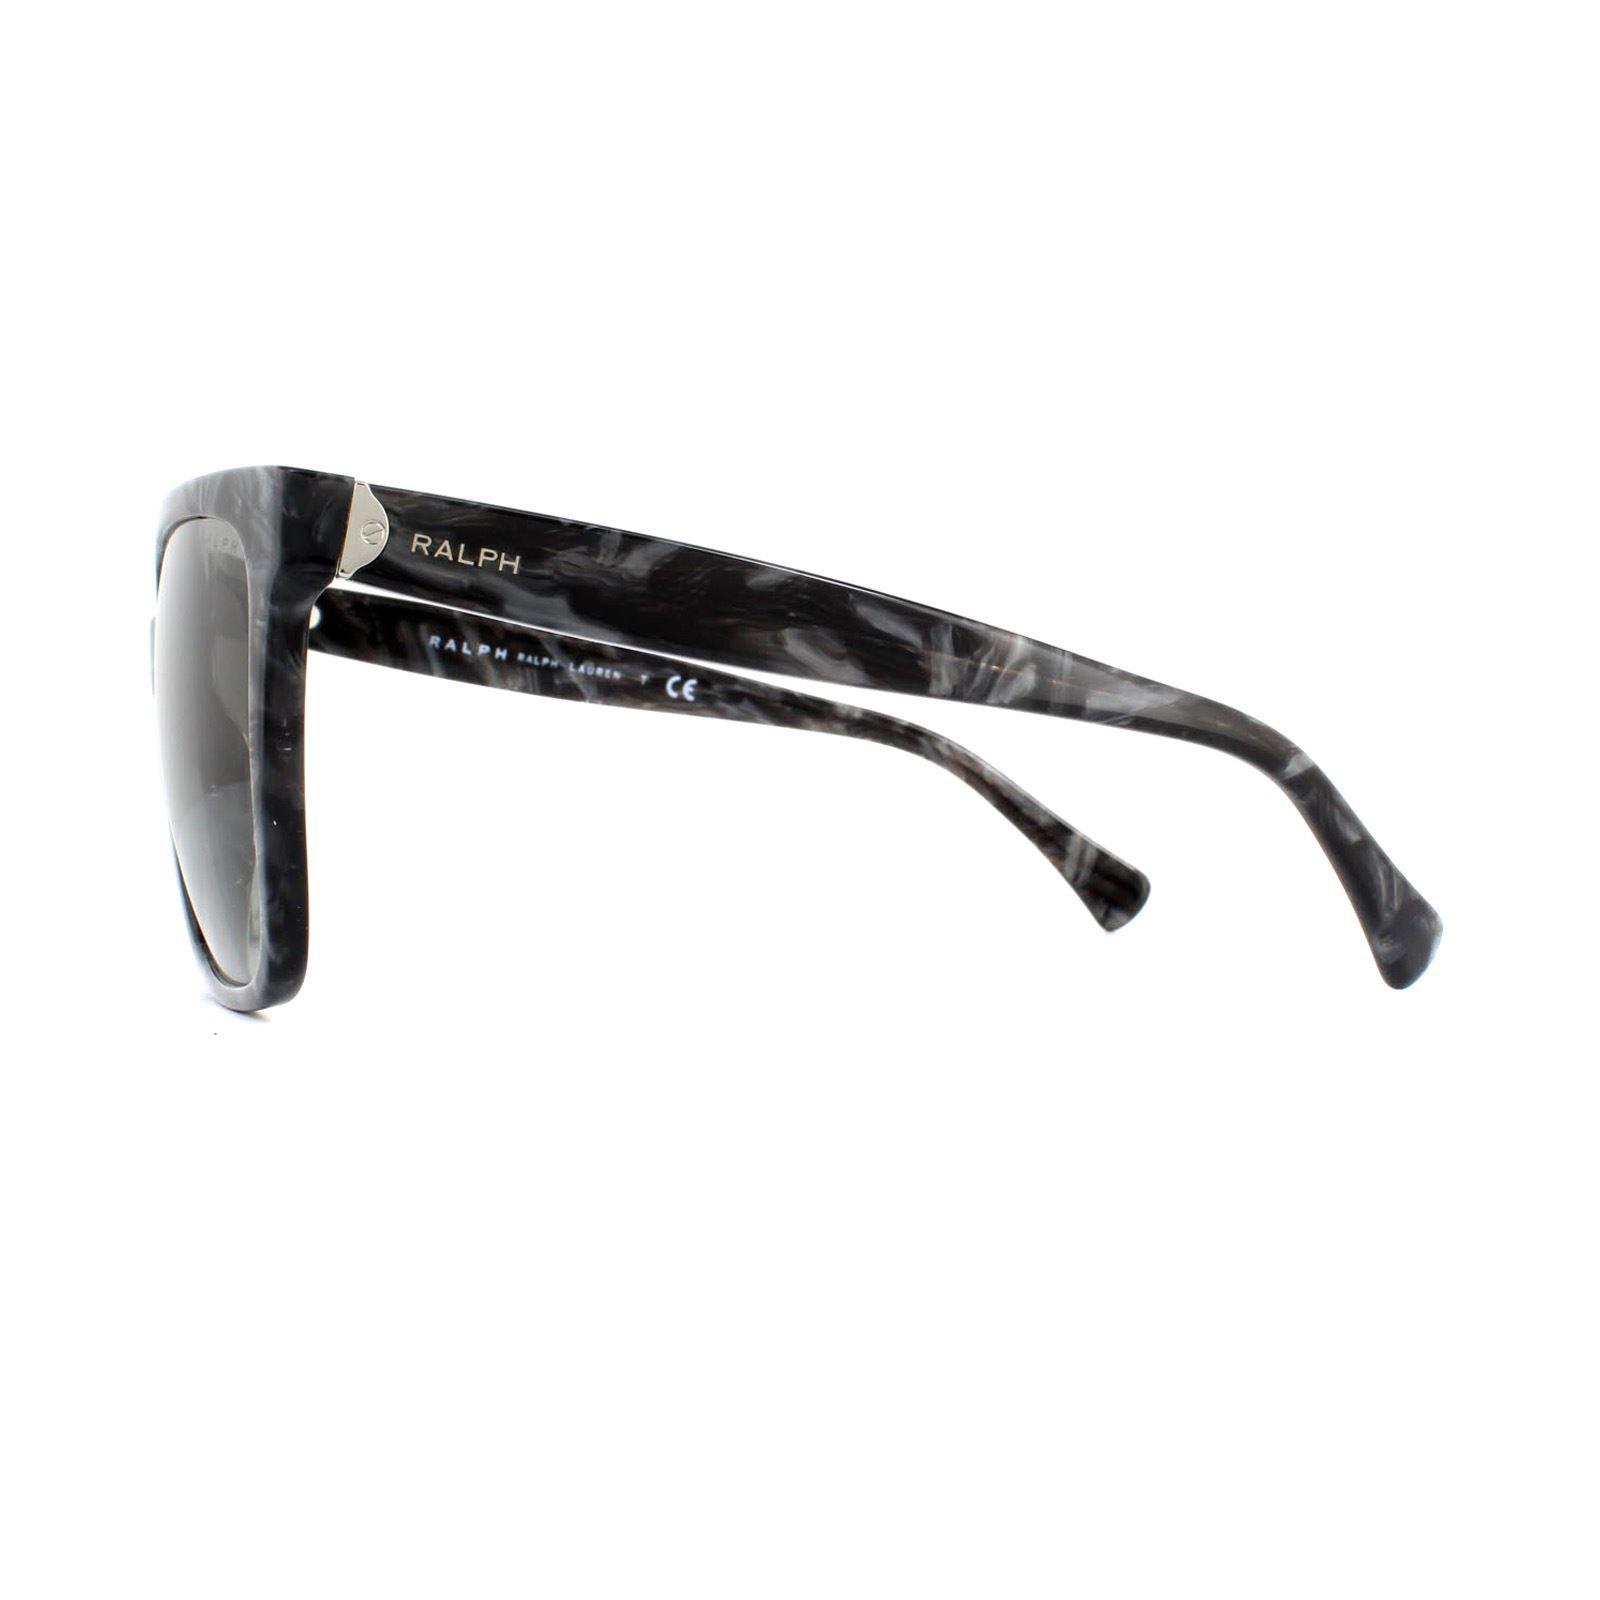 Ralph by Ralph Lauren Sunglasses RA5251 573611 Black Marble Grey Gradient